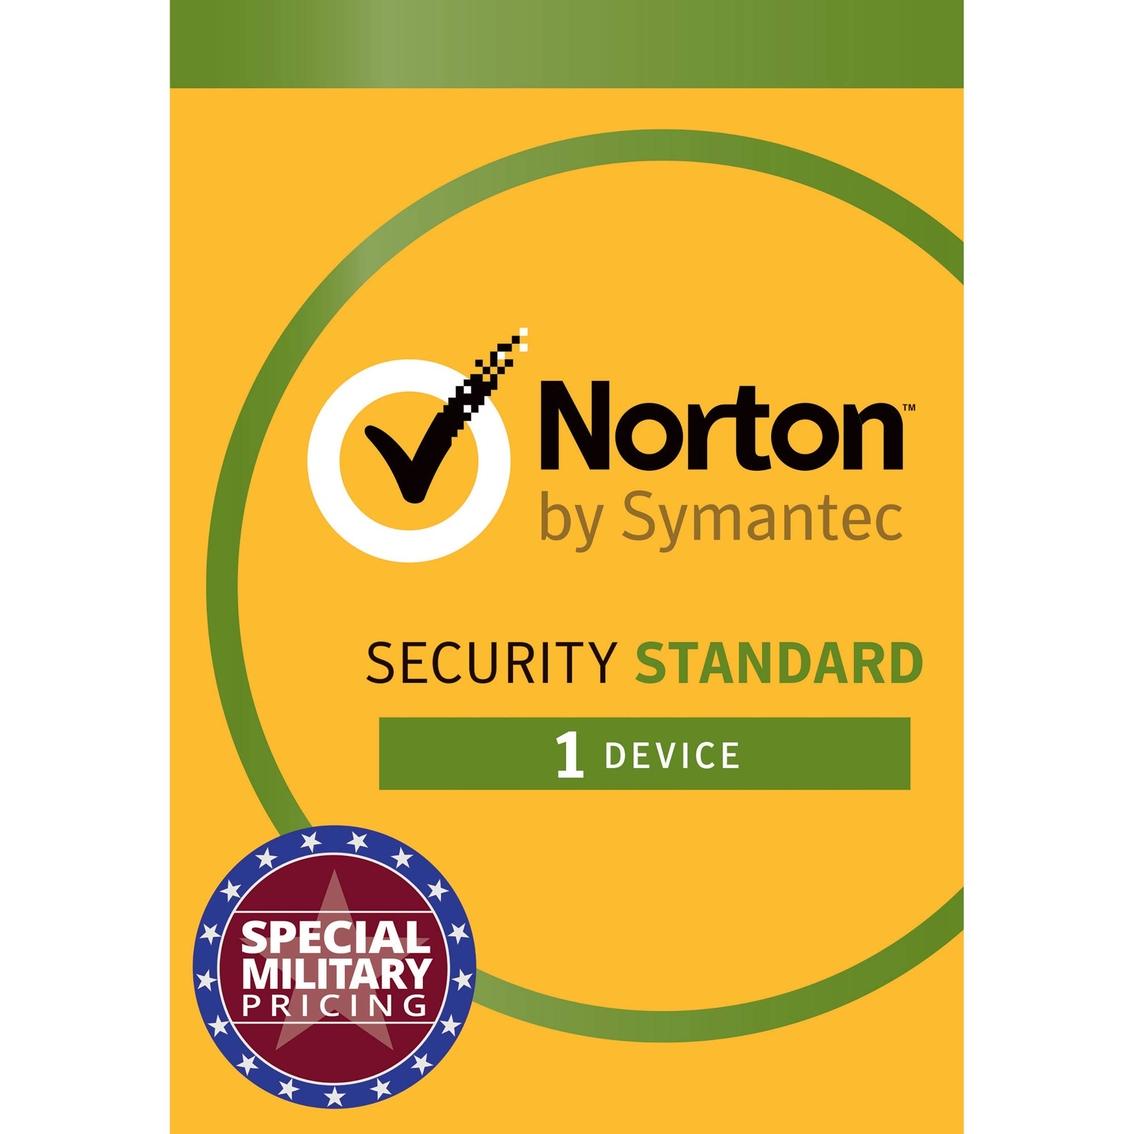 symantec norton security standard 1 device other software electronics shop the exchange. Black Bedroom Furniture Sets. Home Design Ideas